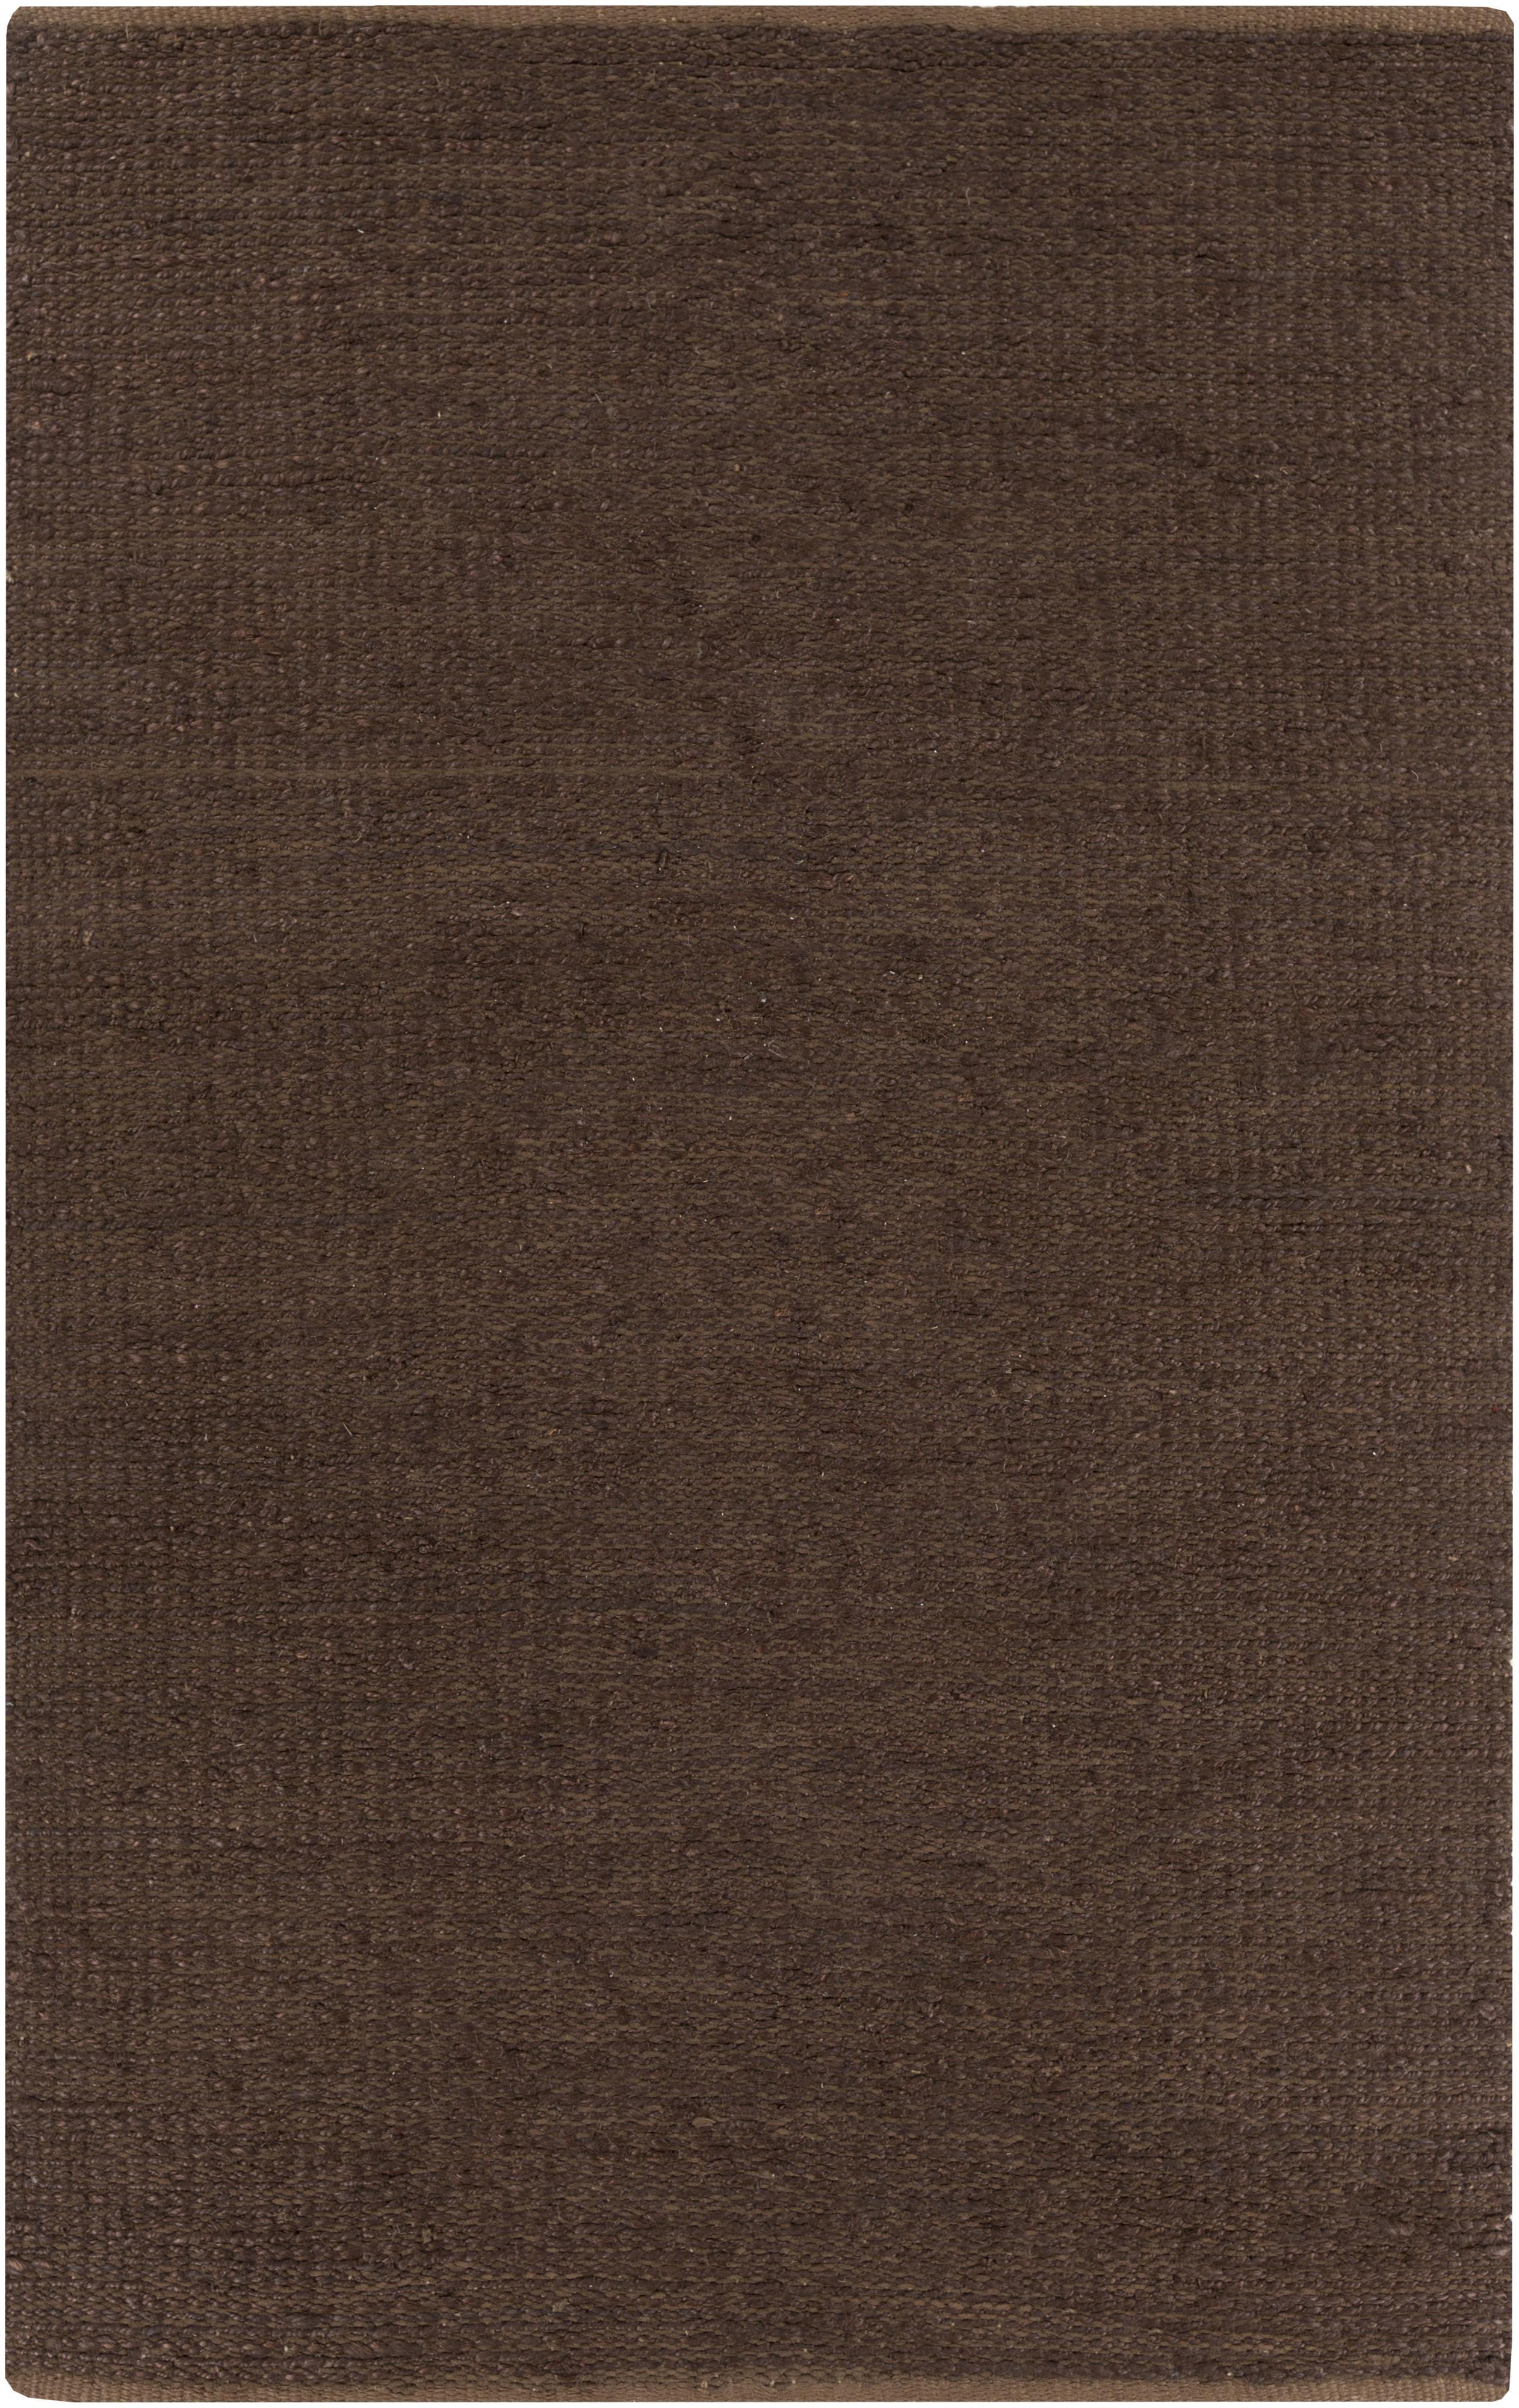 Surya Rugs Tonga 2' x 3' - Item Number: TGA6000-23